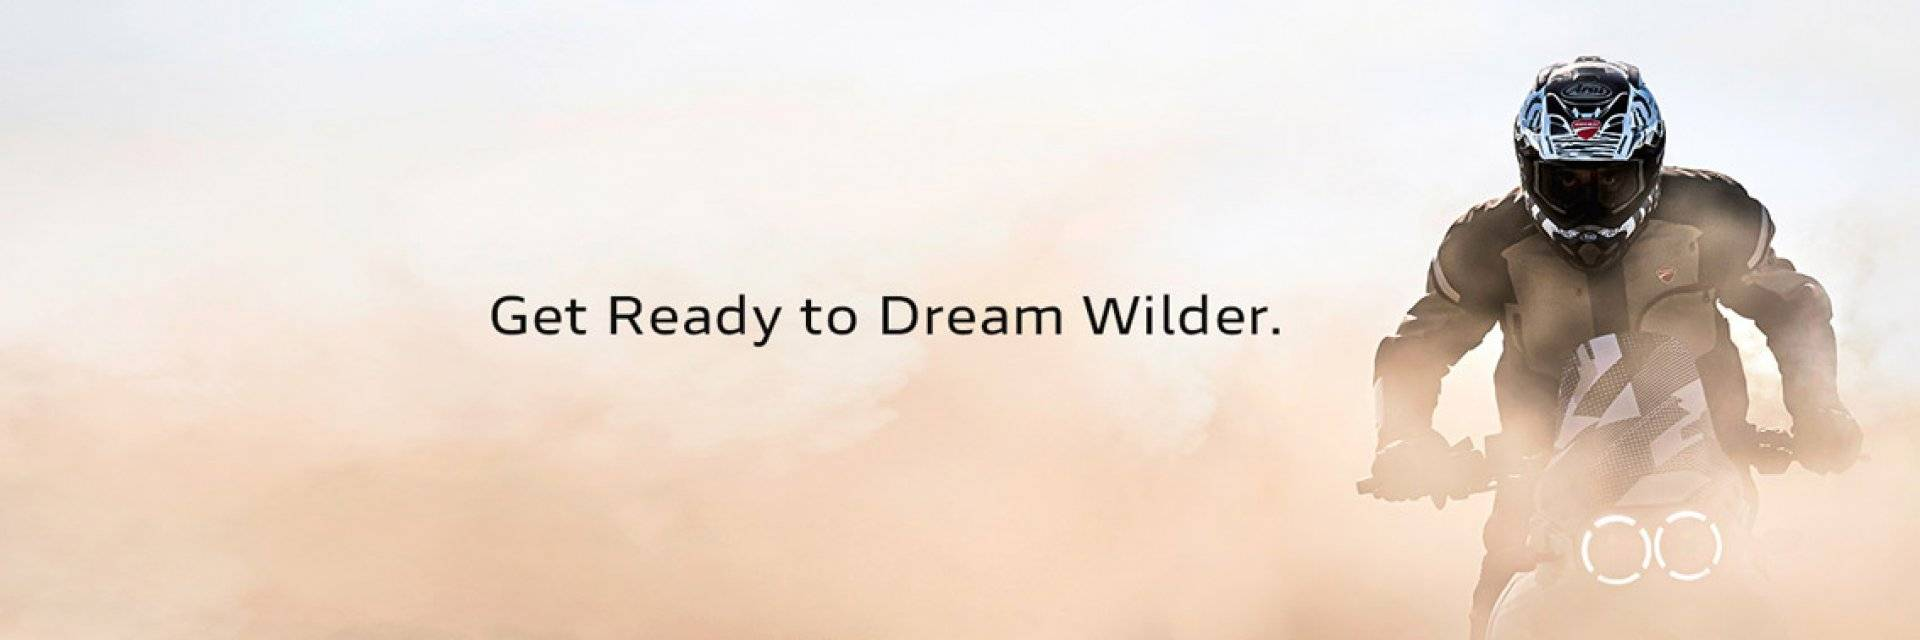 DESERT X DWP22-Teaser-Twitter-Cover_alt01_UC336317_low